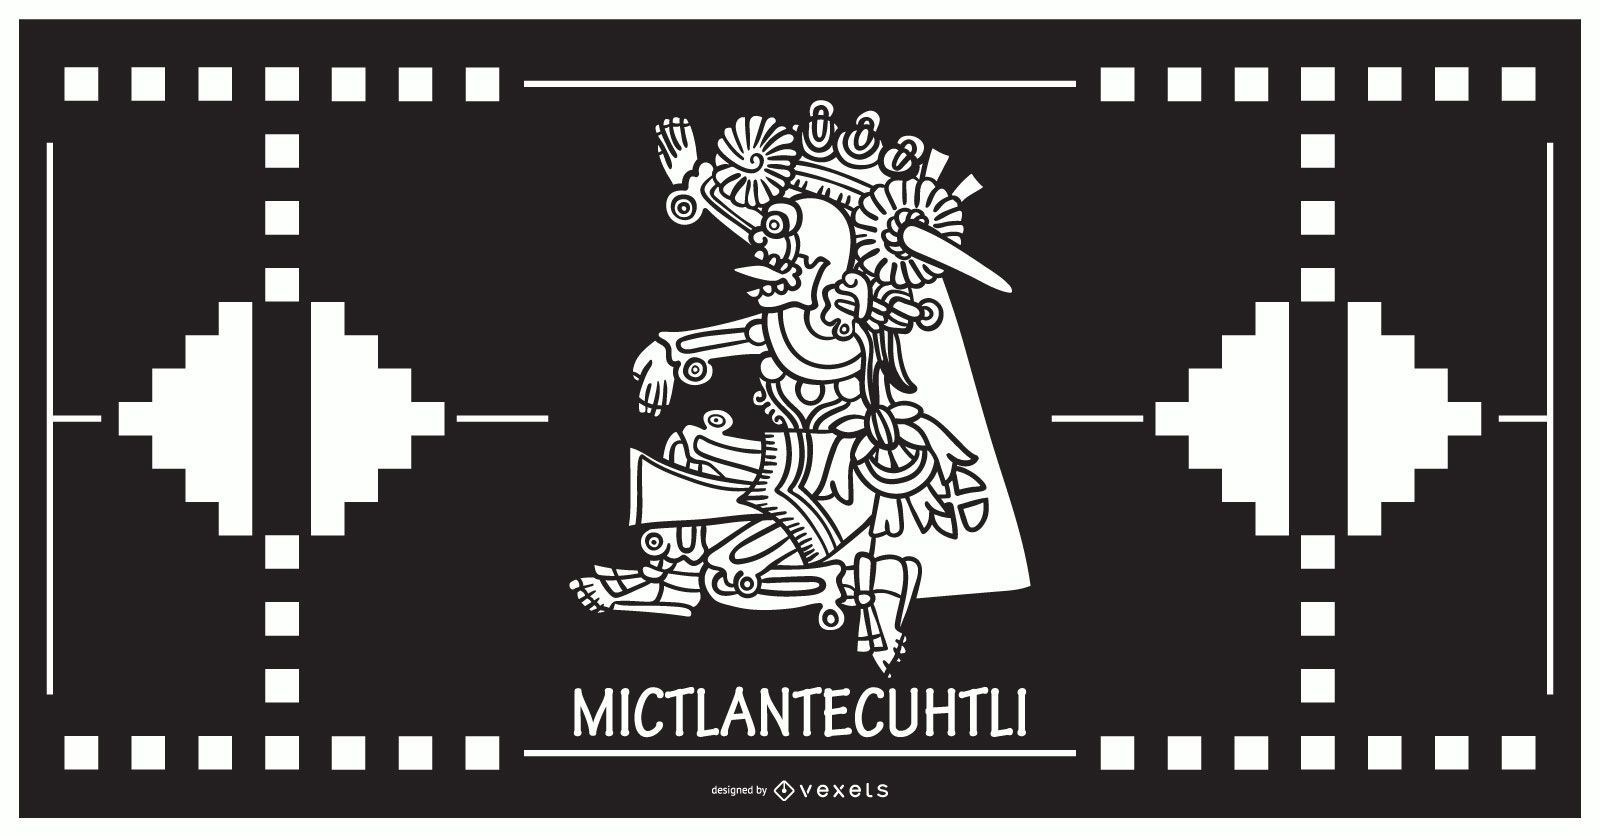 Mictlantecuhtli aztec god design